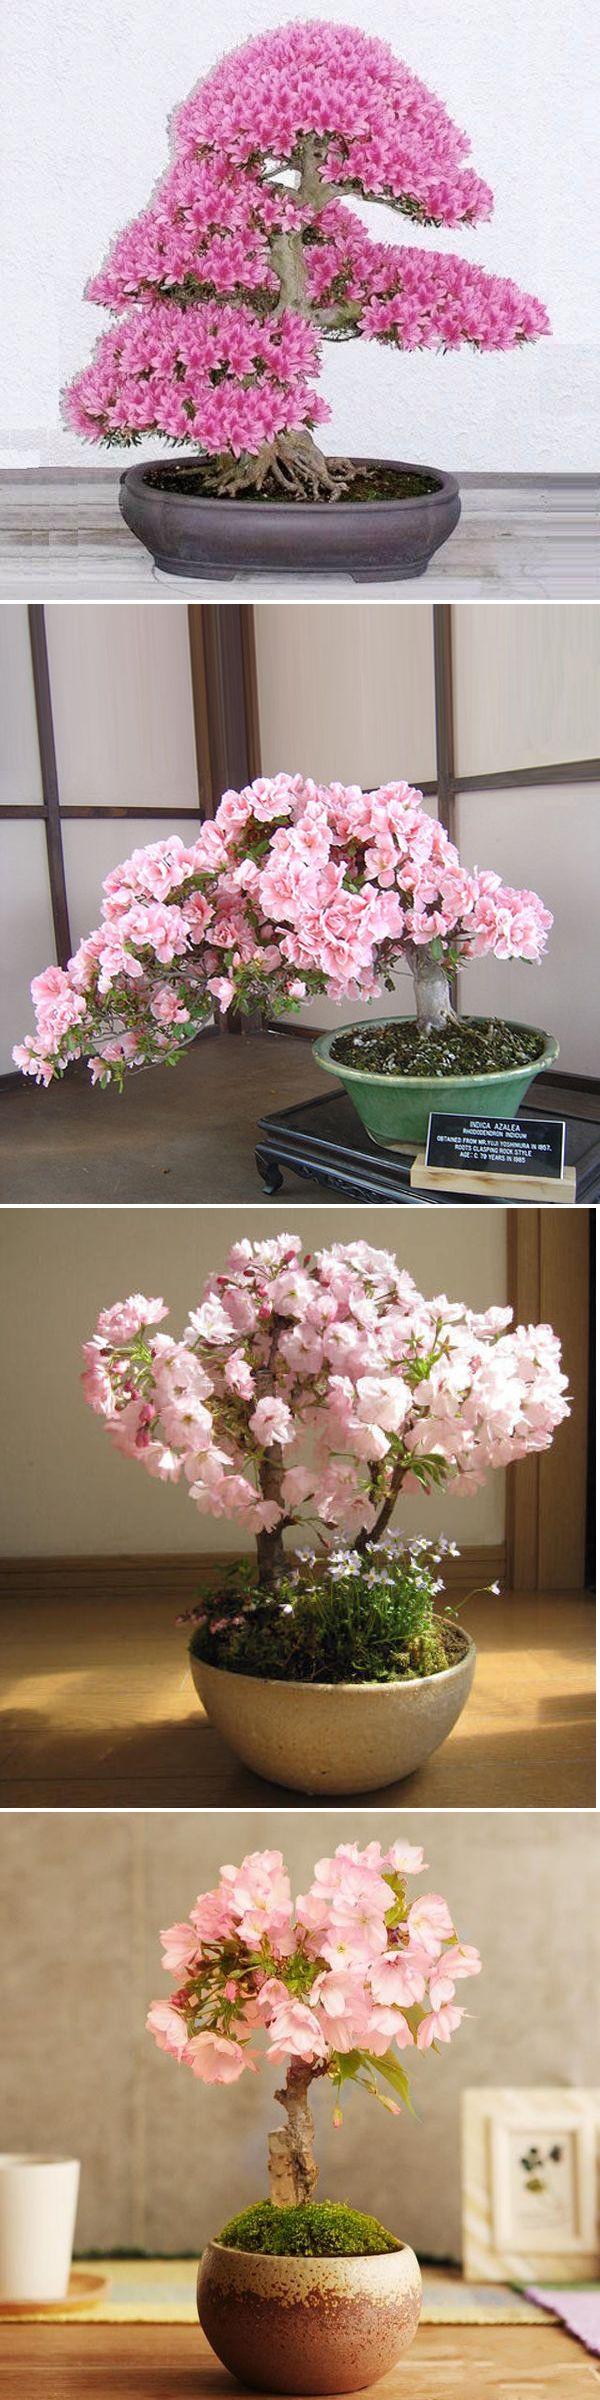 US$2.39 10Pcs Rare Sakura Seeds Cherry Blossoms Seeds Garden Flower Bonsai Tree